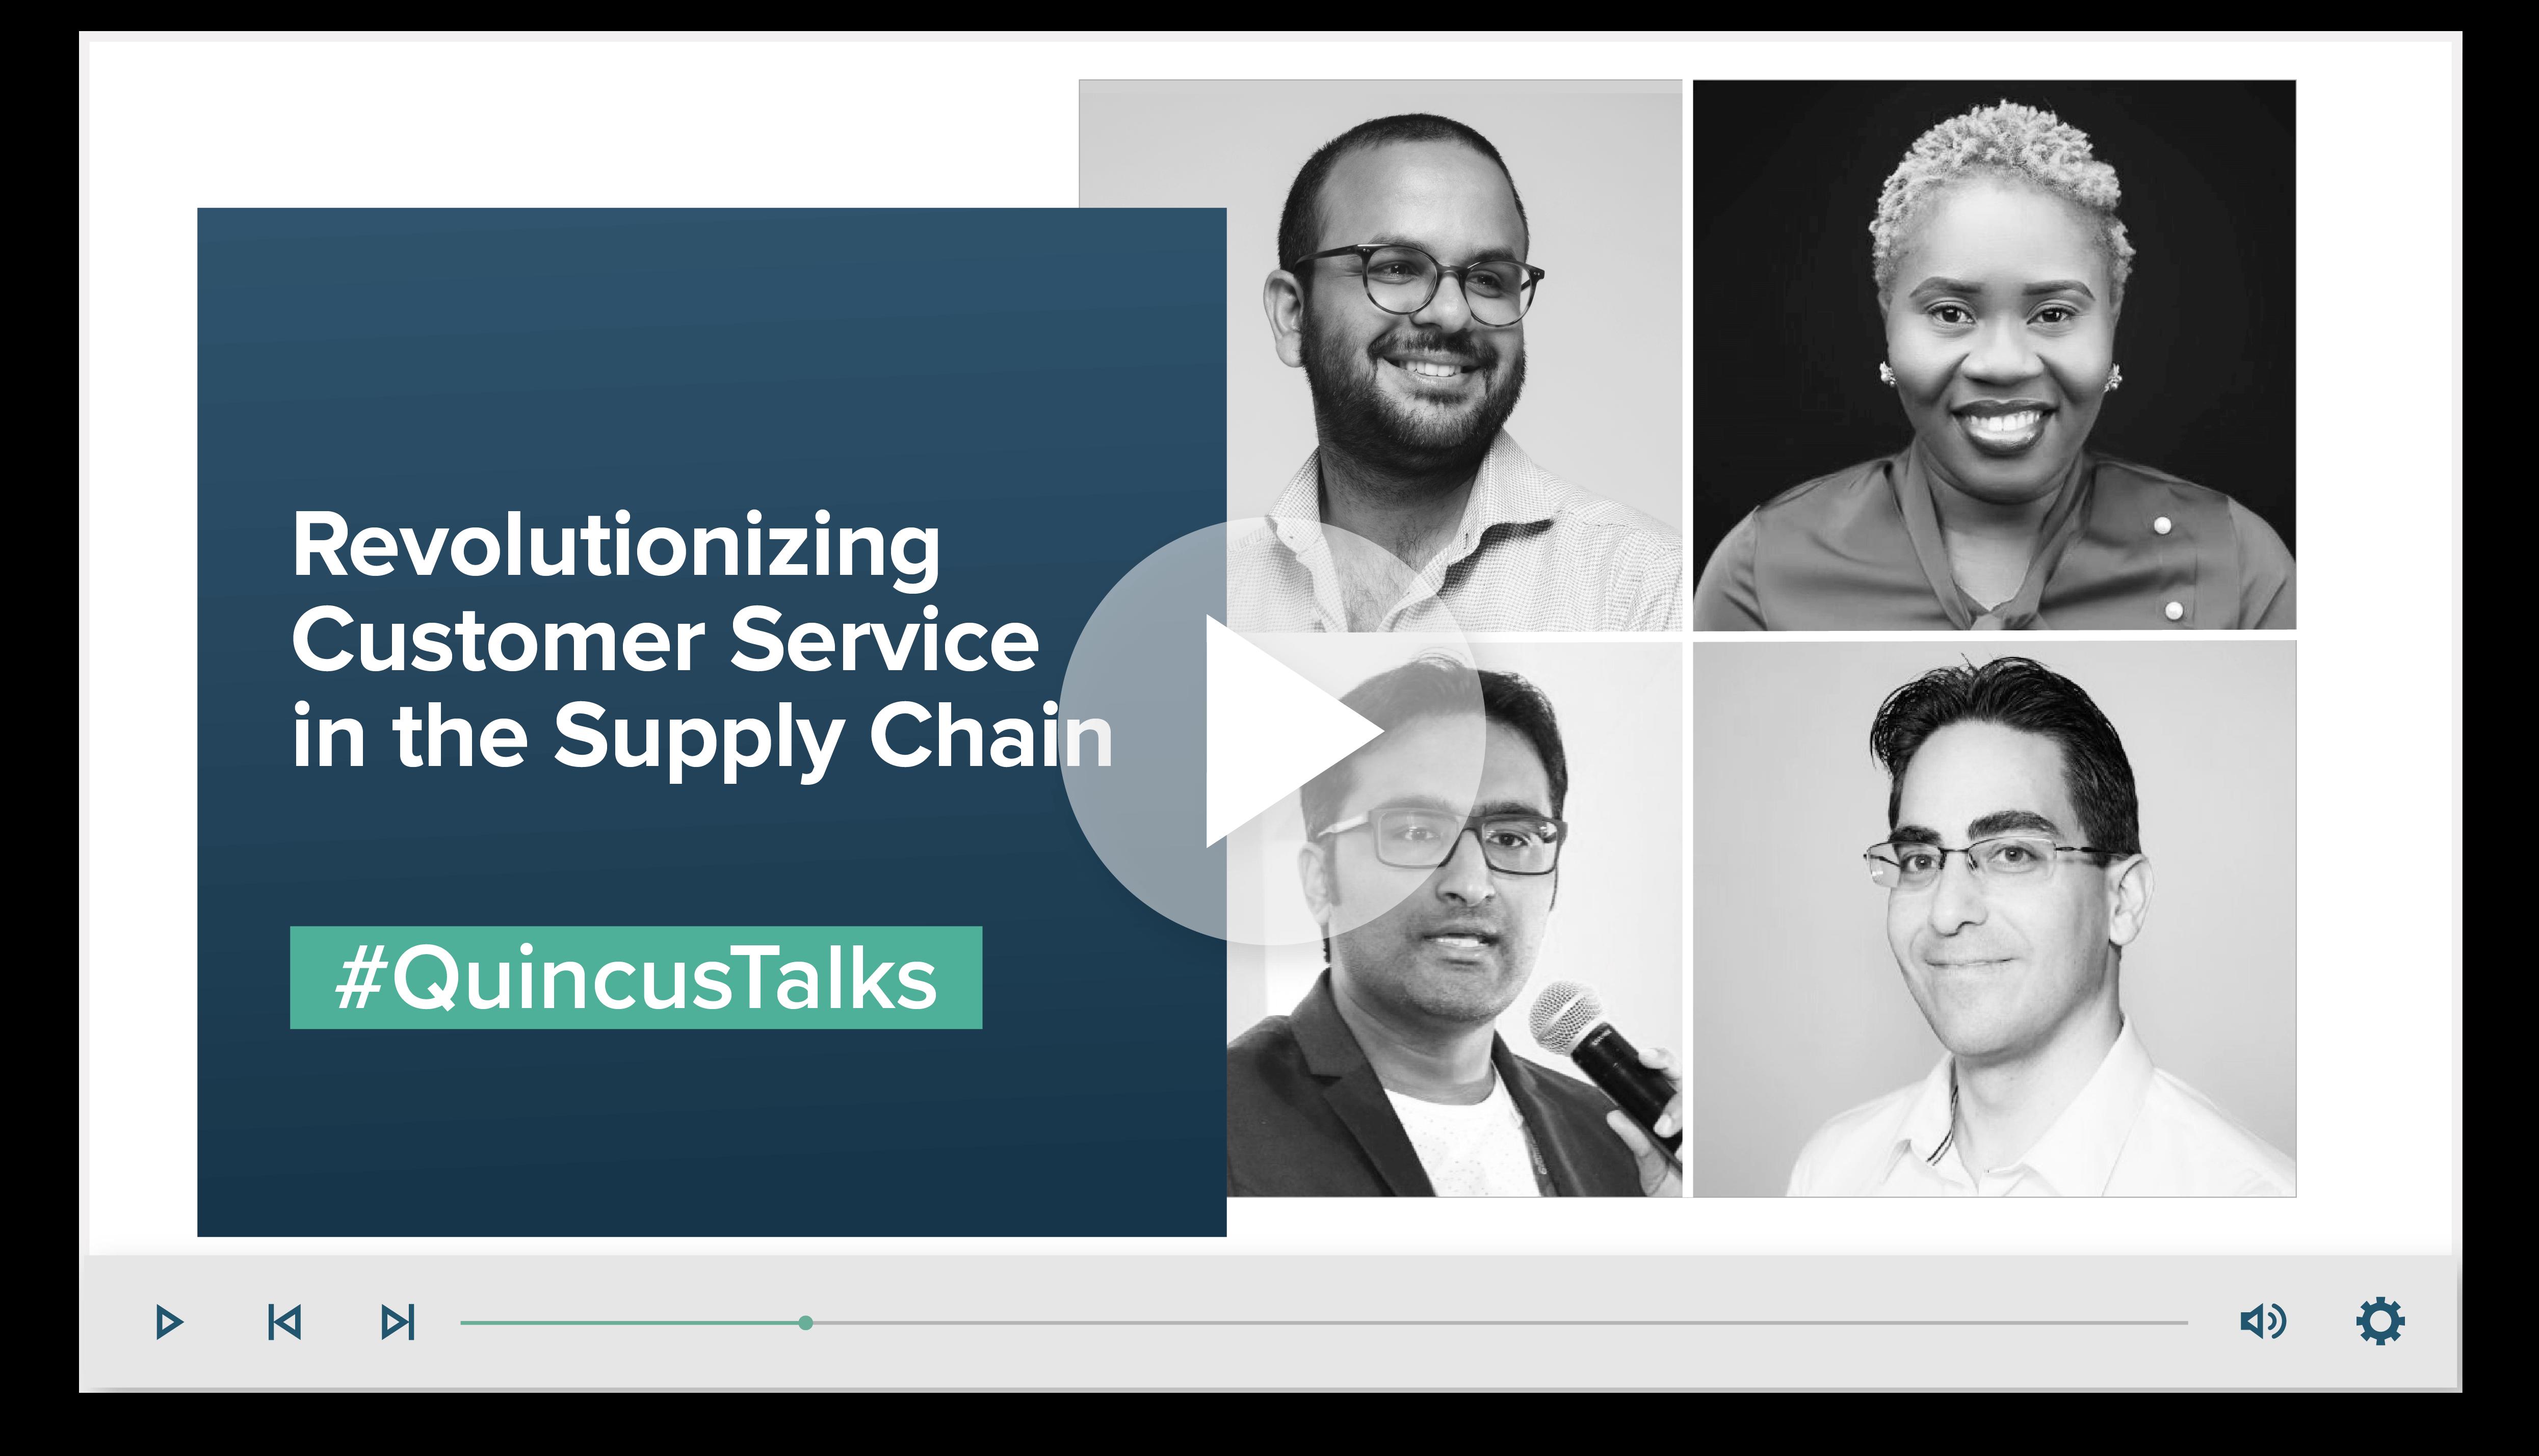 #4: Revolutionizing Customer Service in the Supply Chain